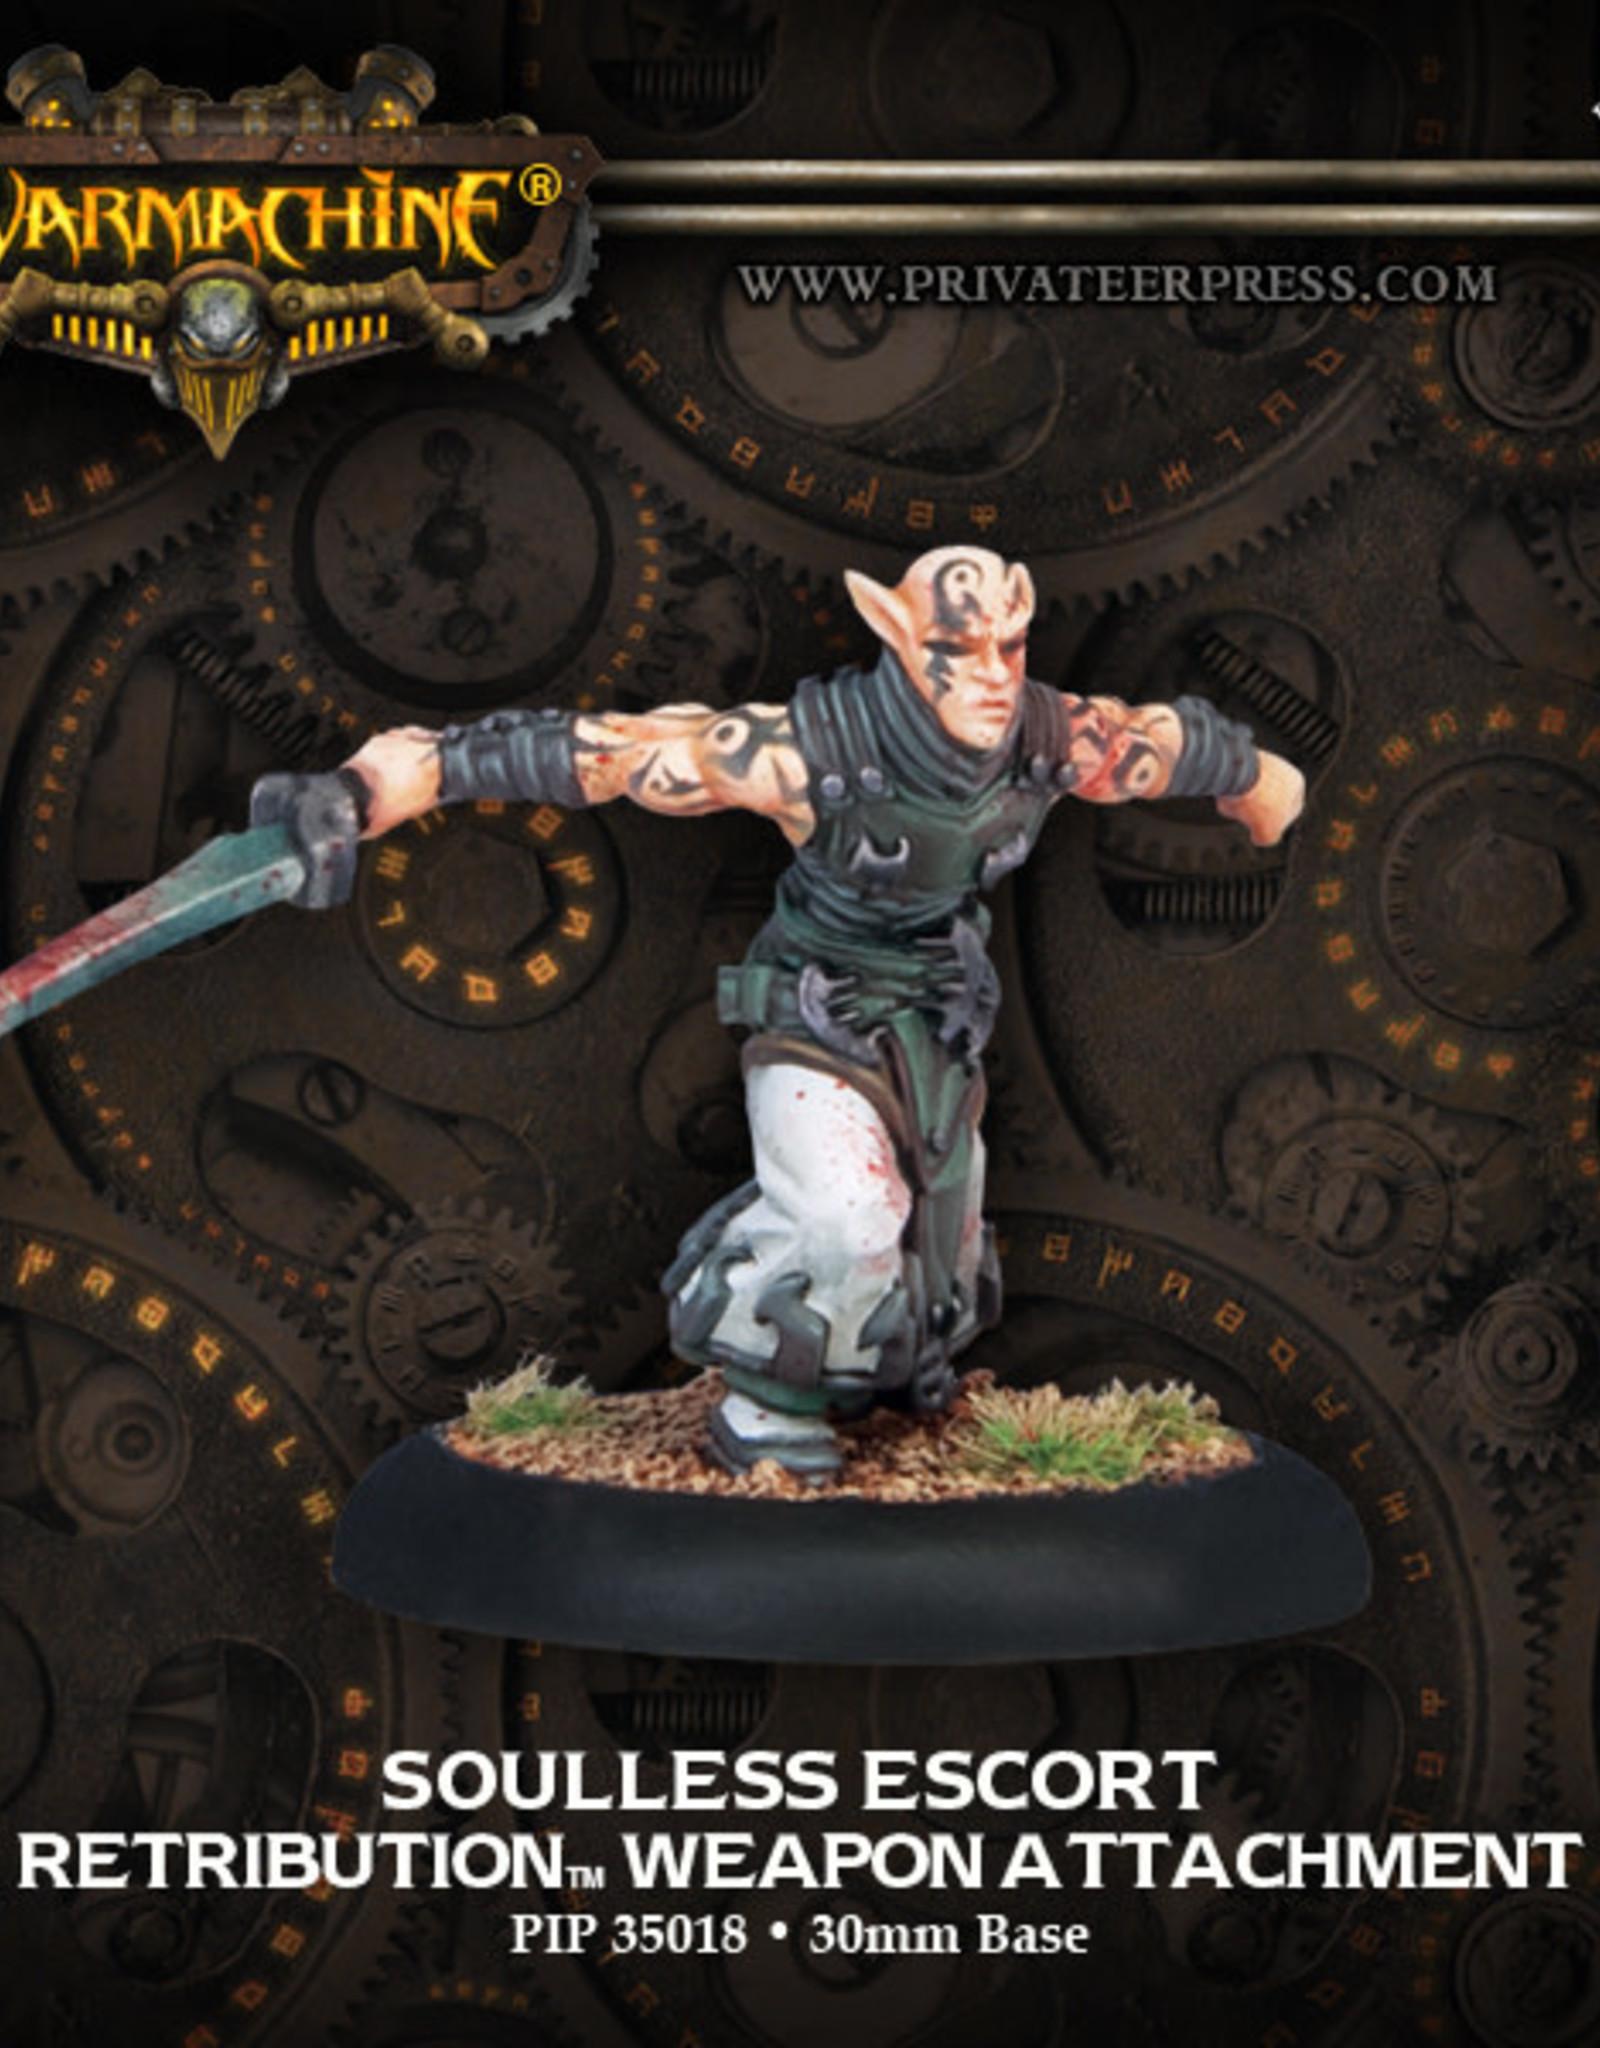 Warmachine Scyrah - Soulless Escort